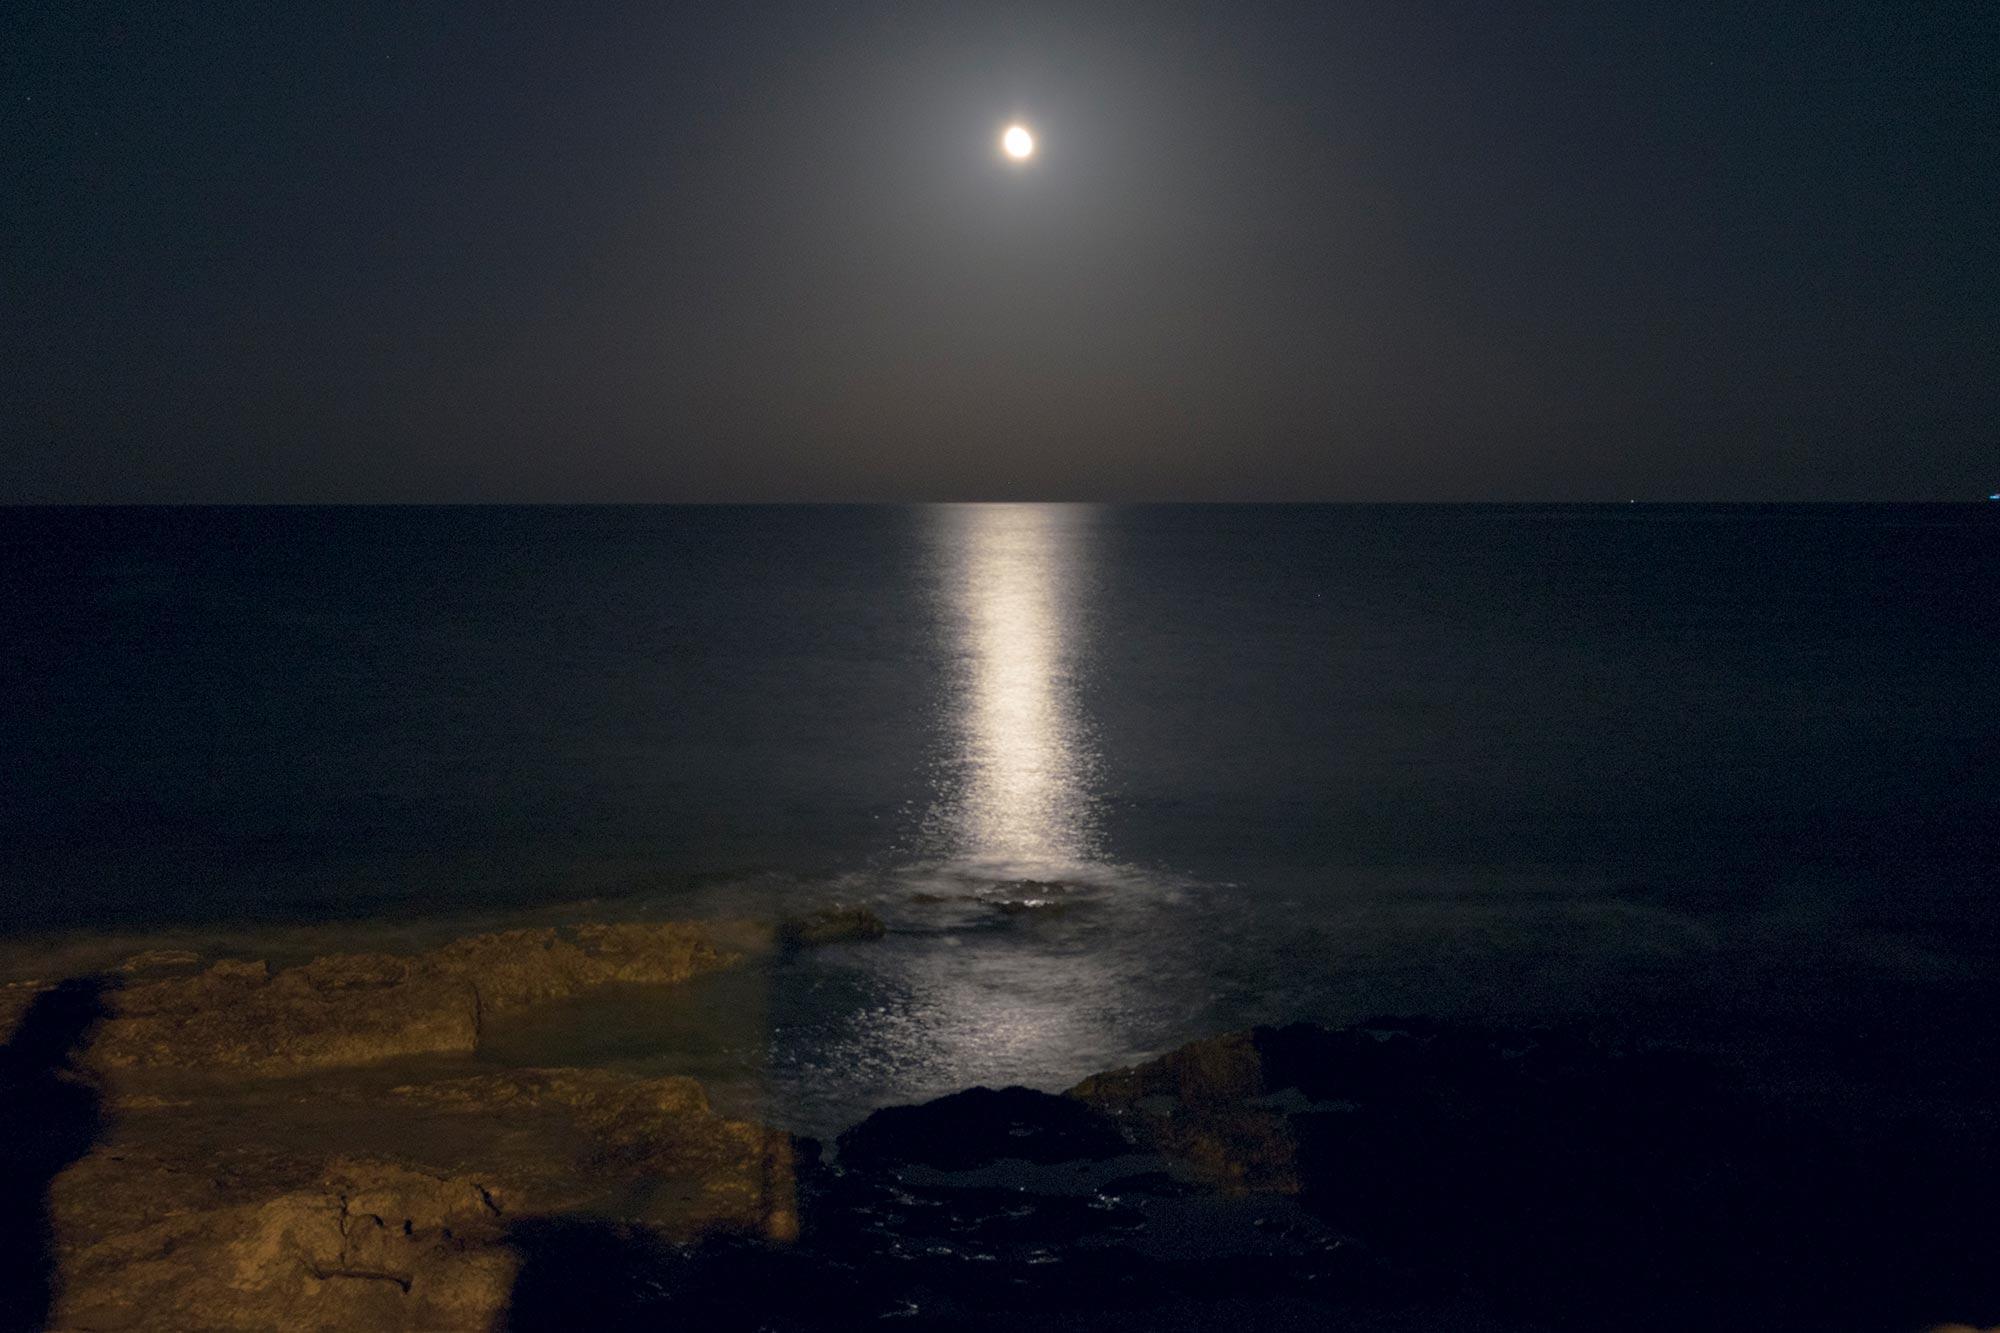 italy-sicilia-marzamemi-sea-moon